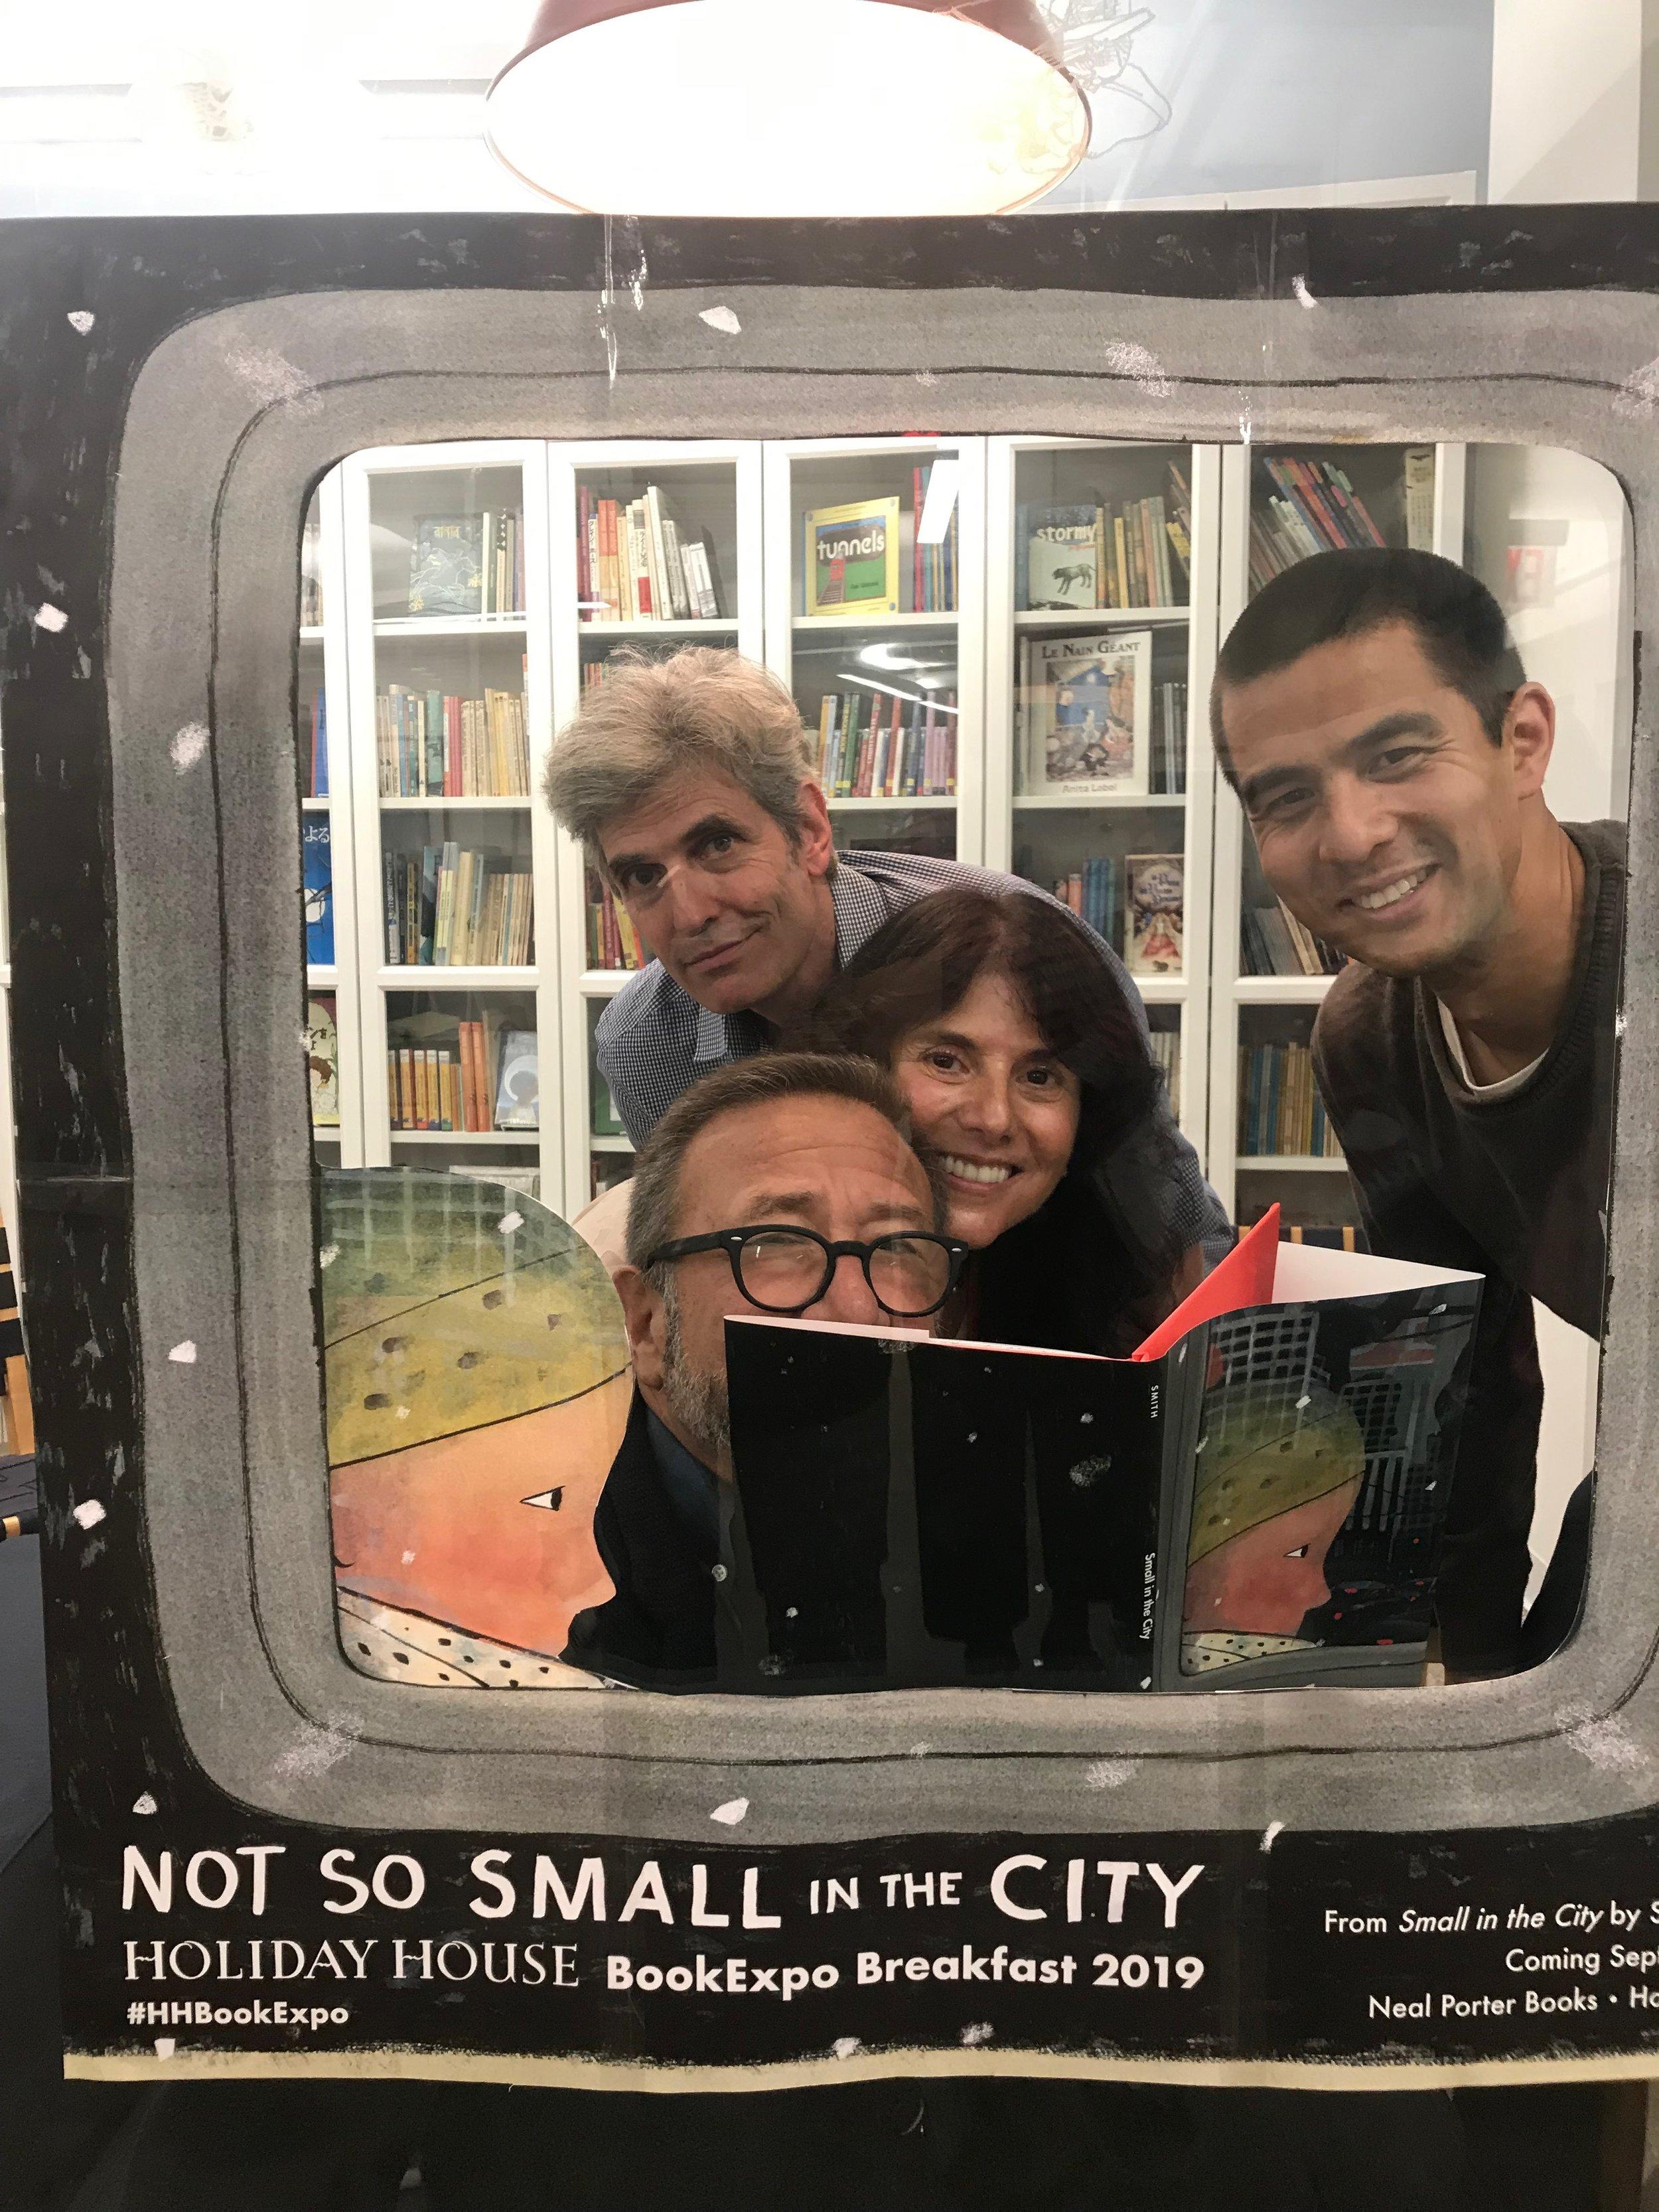 Pictured: Stephen Savage, Neal Porter, me, Jason Chin